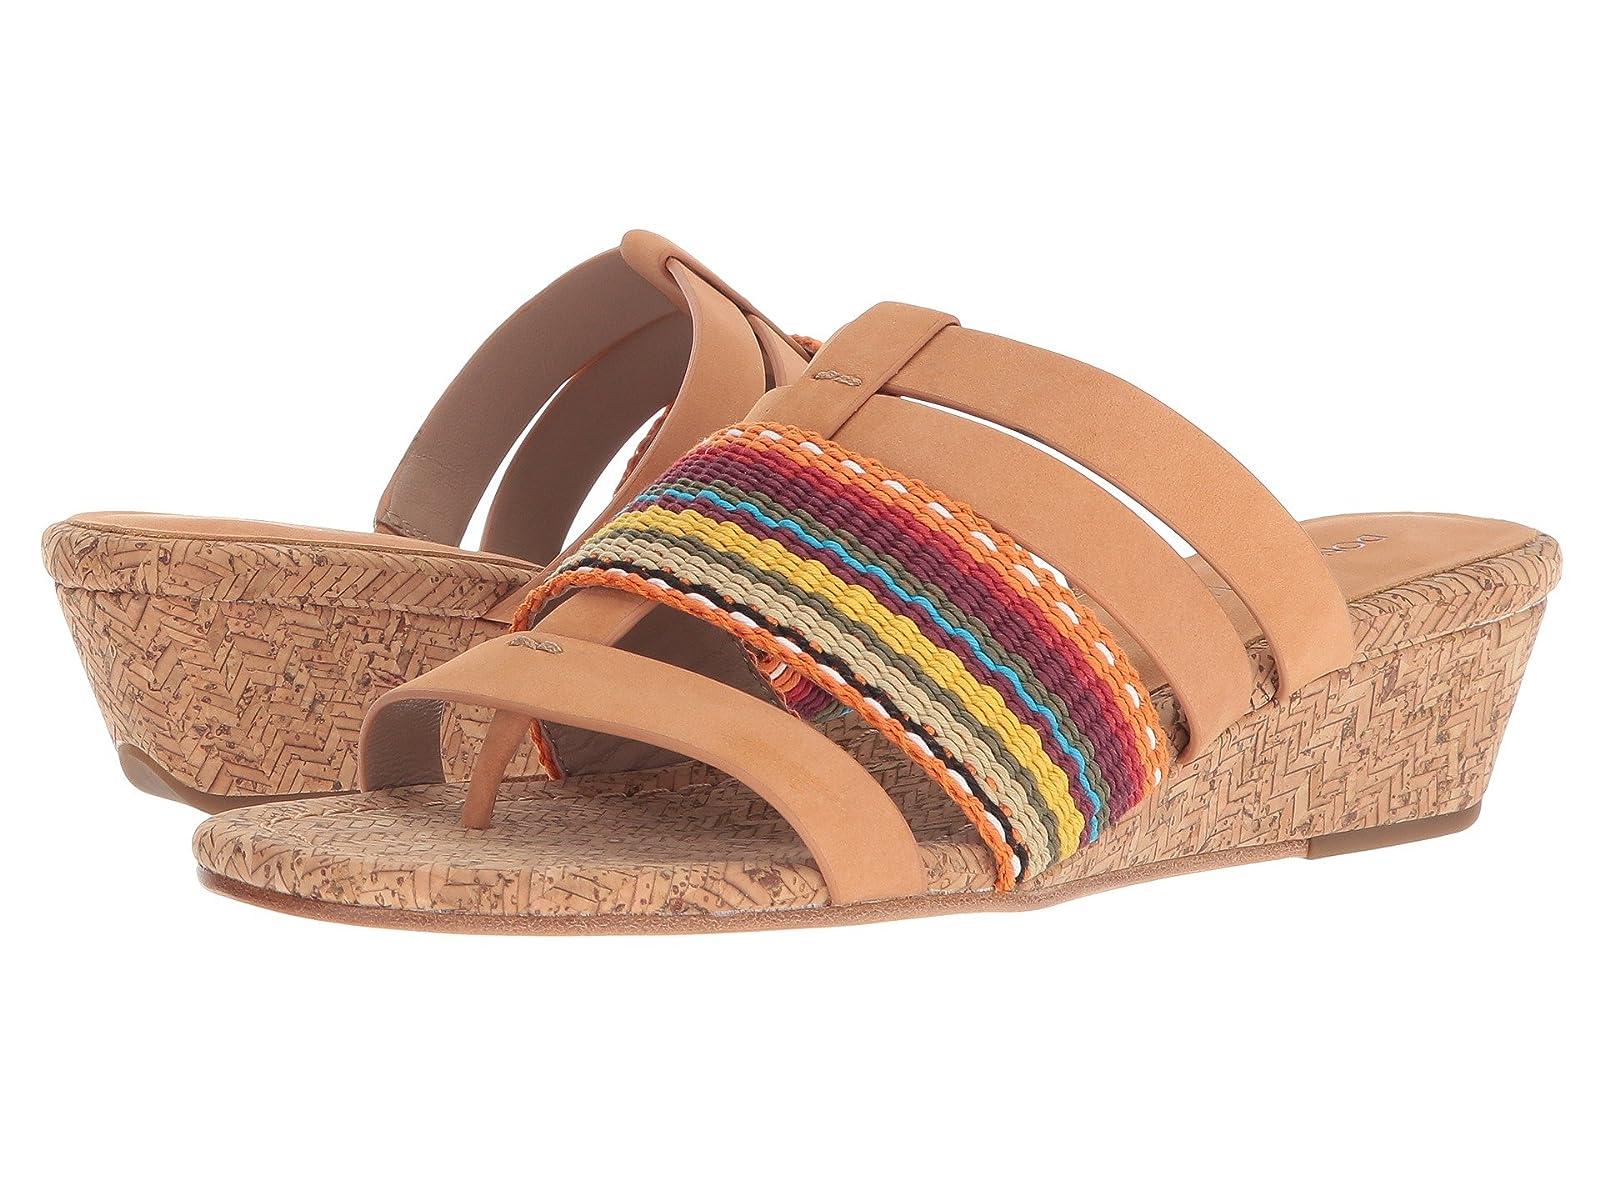 Donald J Pliner DaraCheap and distinctive eye-catching shoes